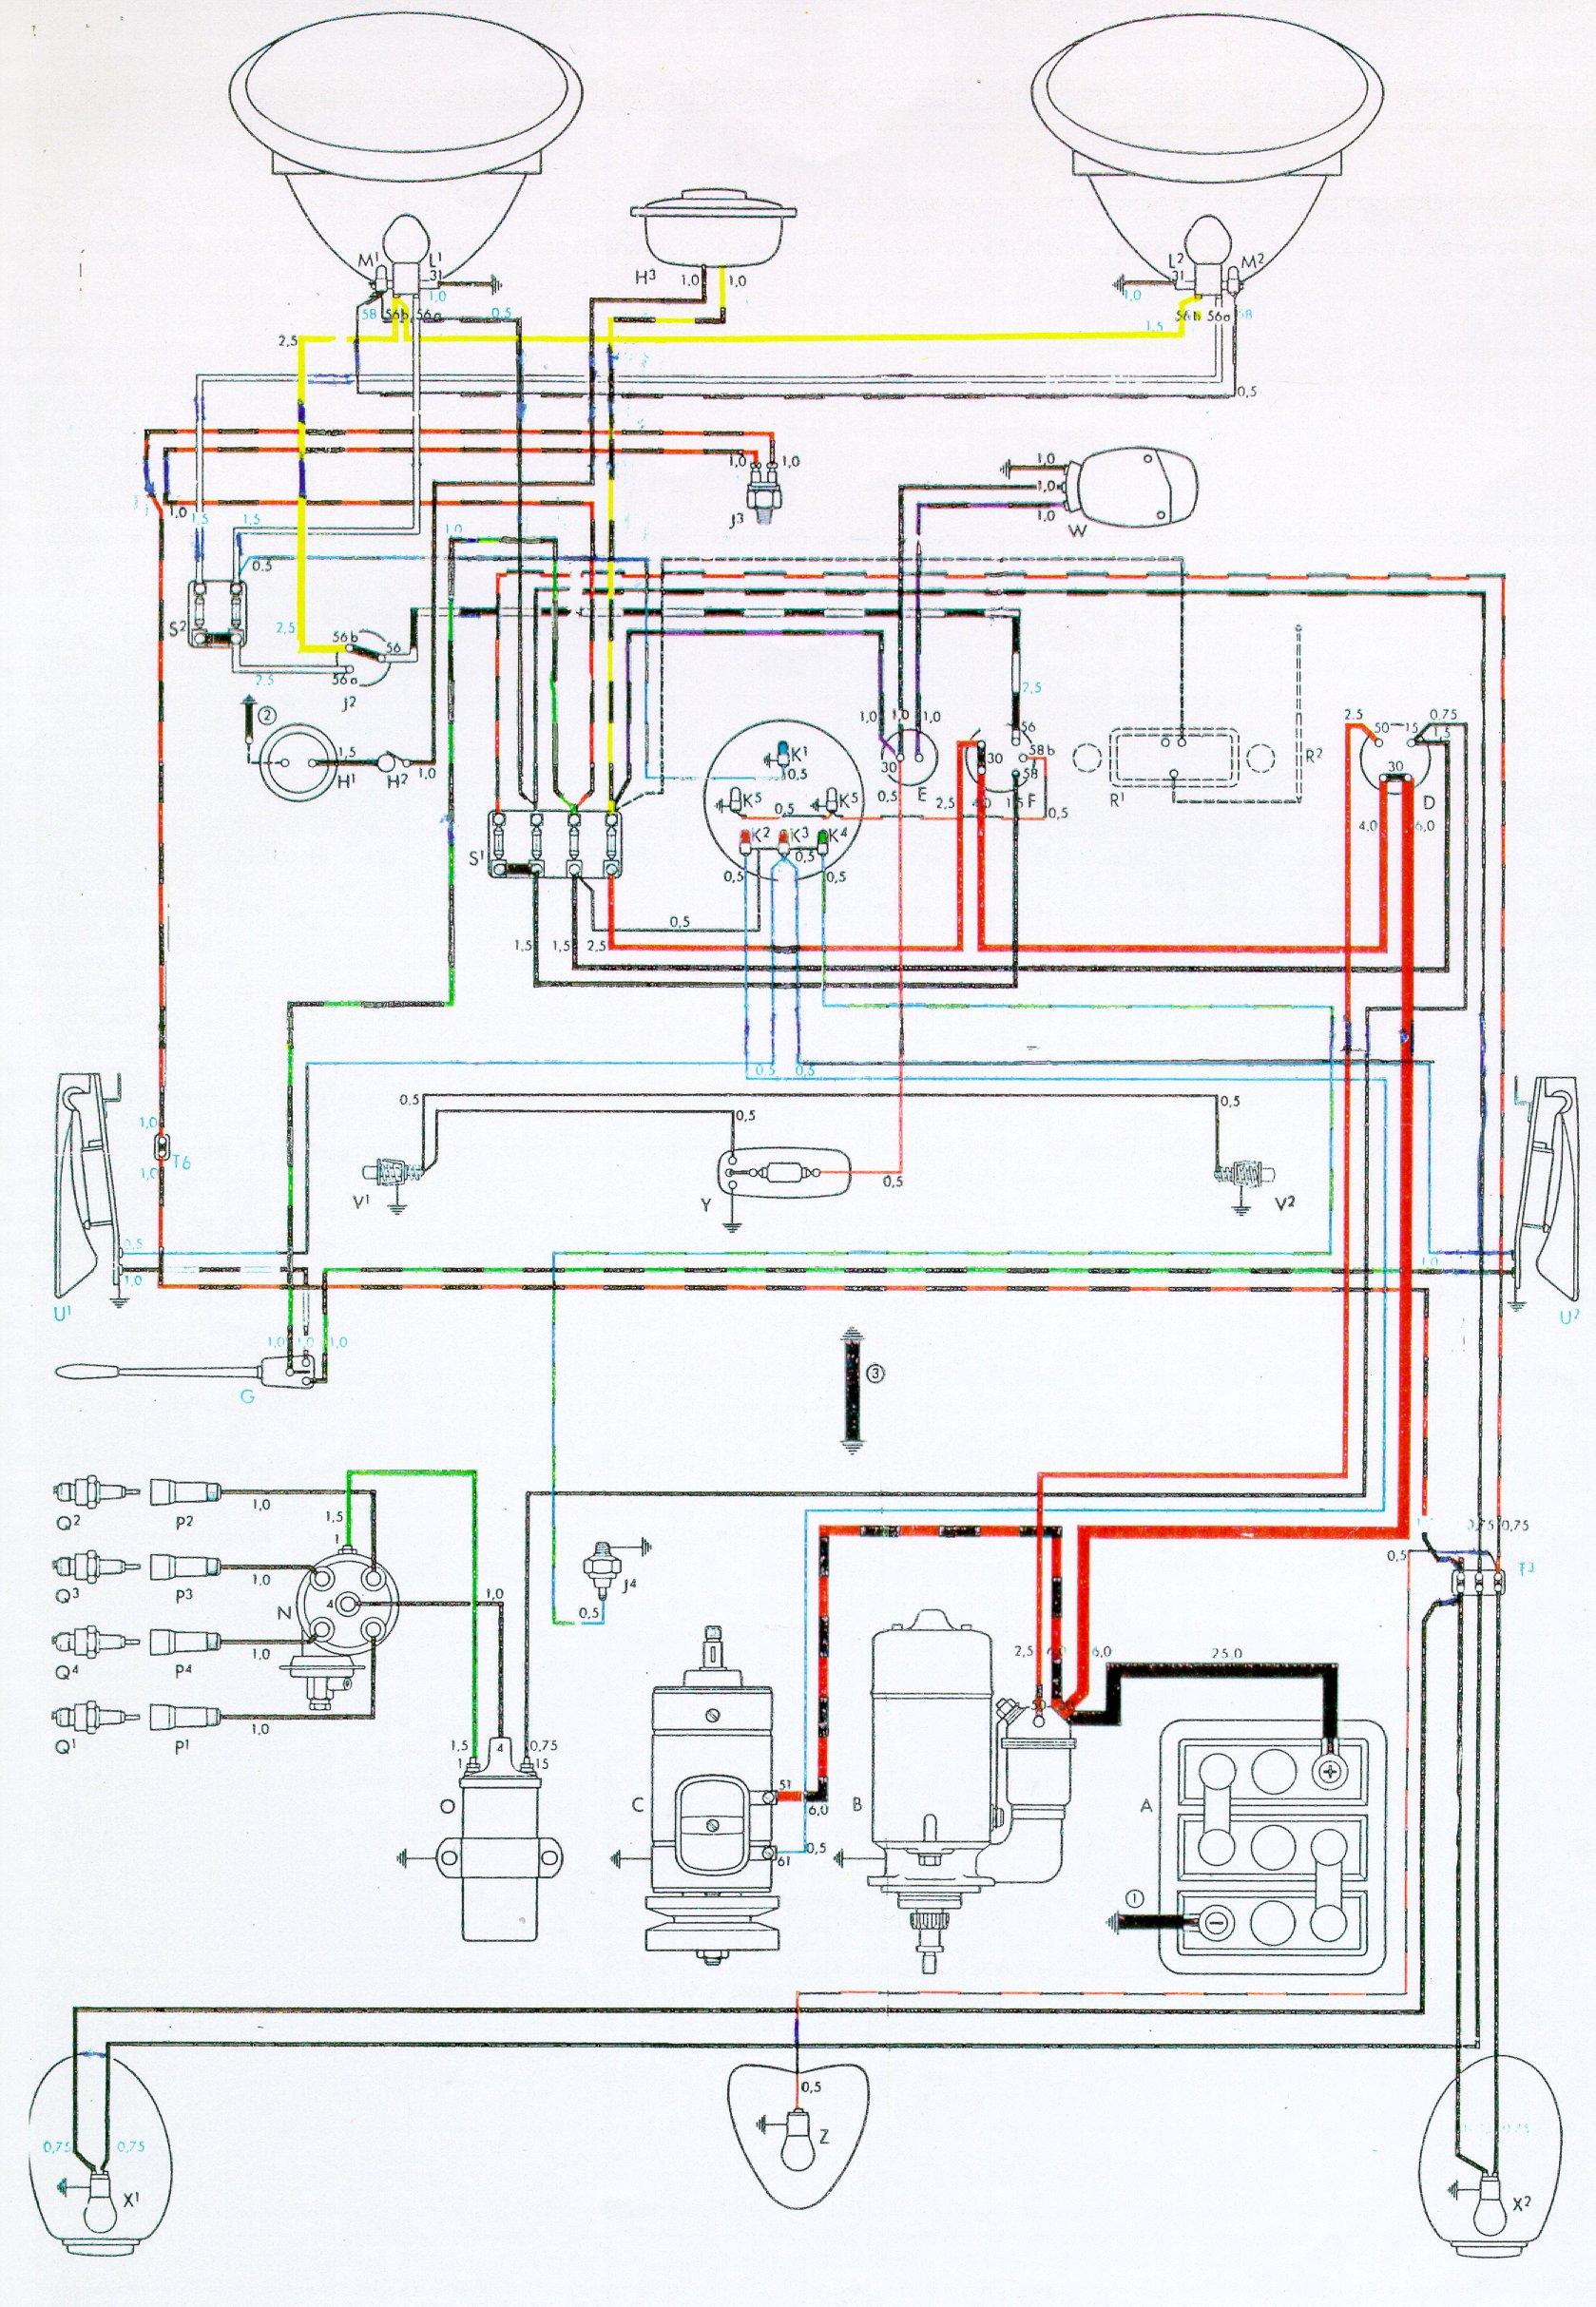 hight resolution of 1974 vw beetle fuse box 1974 vw beetle wiring diagram 1974 vw beetle engine diagram 1974